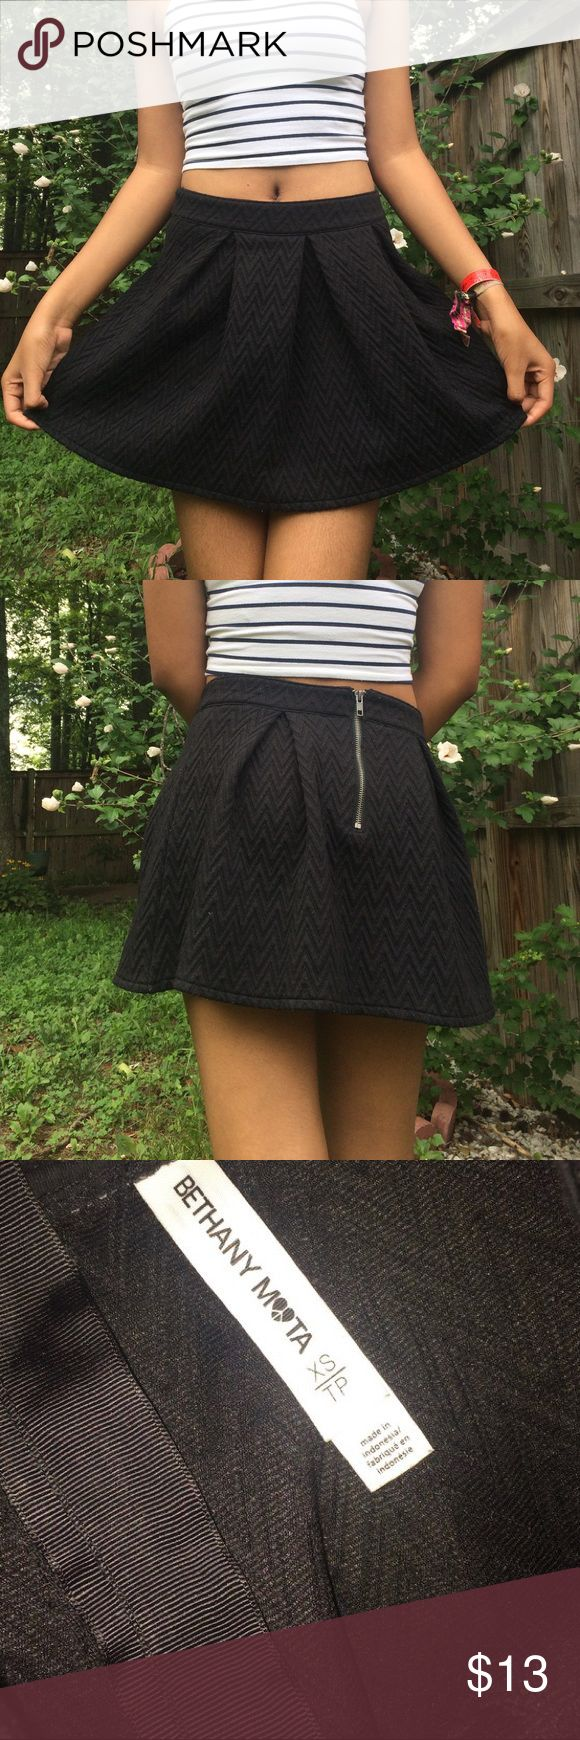 black chevron skirt originally from aeropostale. part of the bethany mota collection. 100% polyester. Aeropostale Skirts